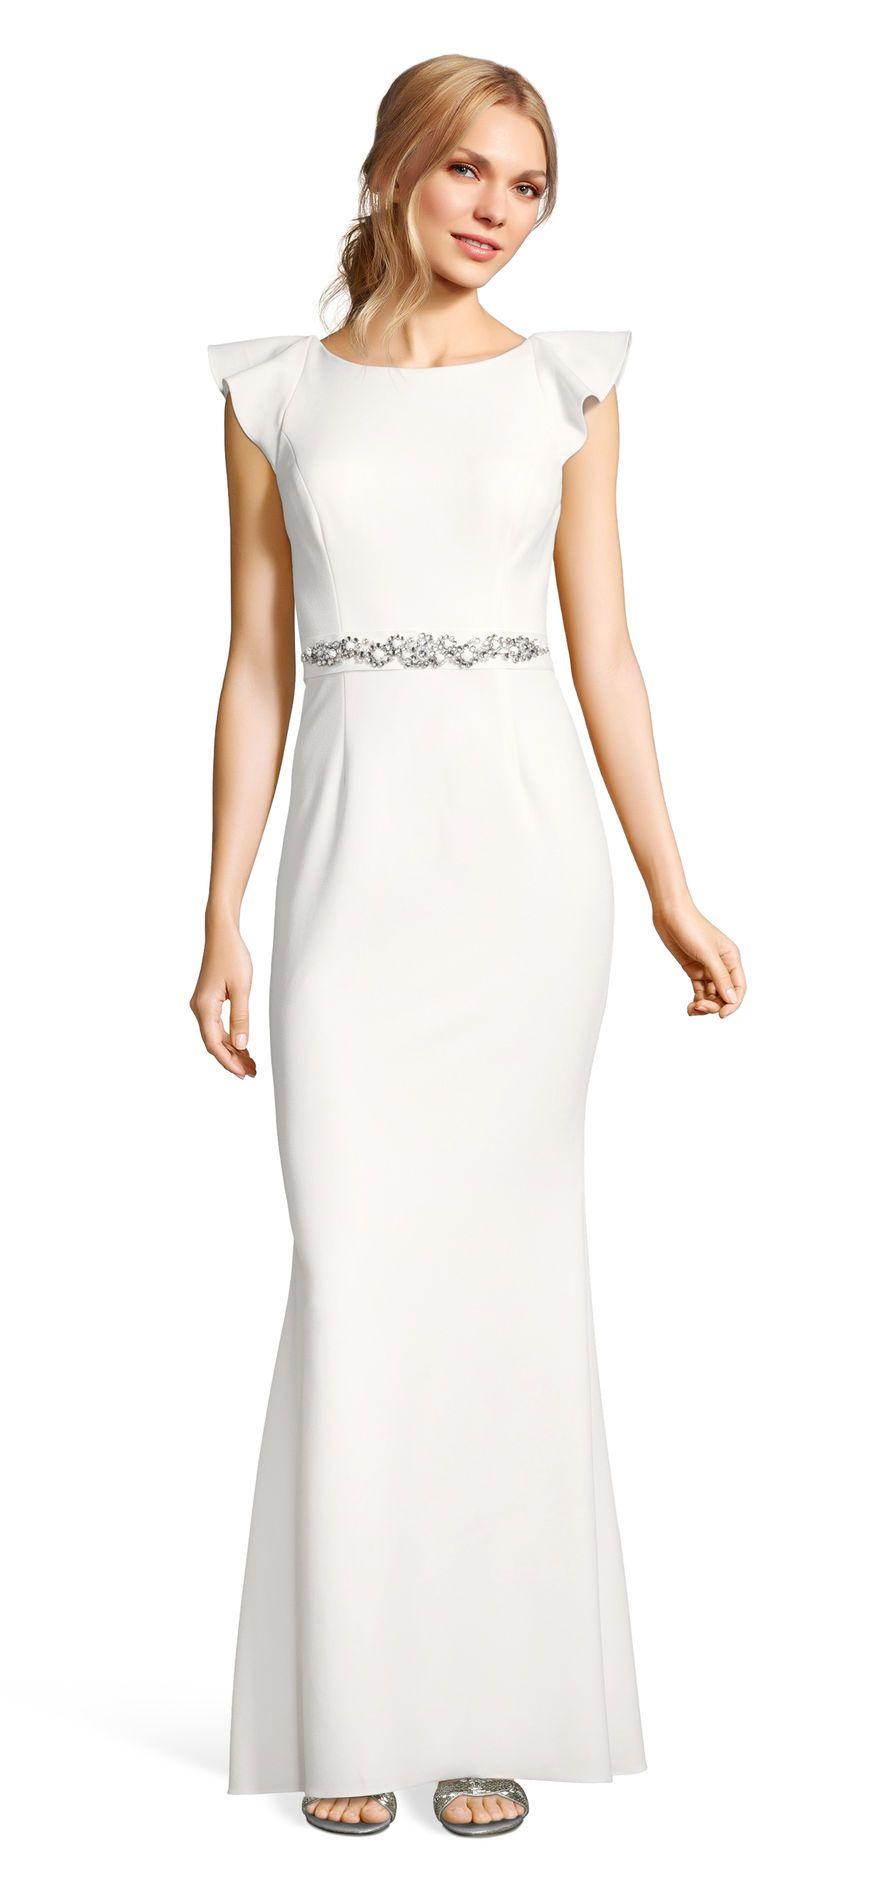 Ruffle sleeve crepe gown with open back and jeweled sash wedding